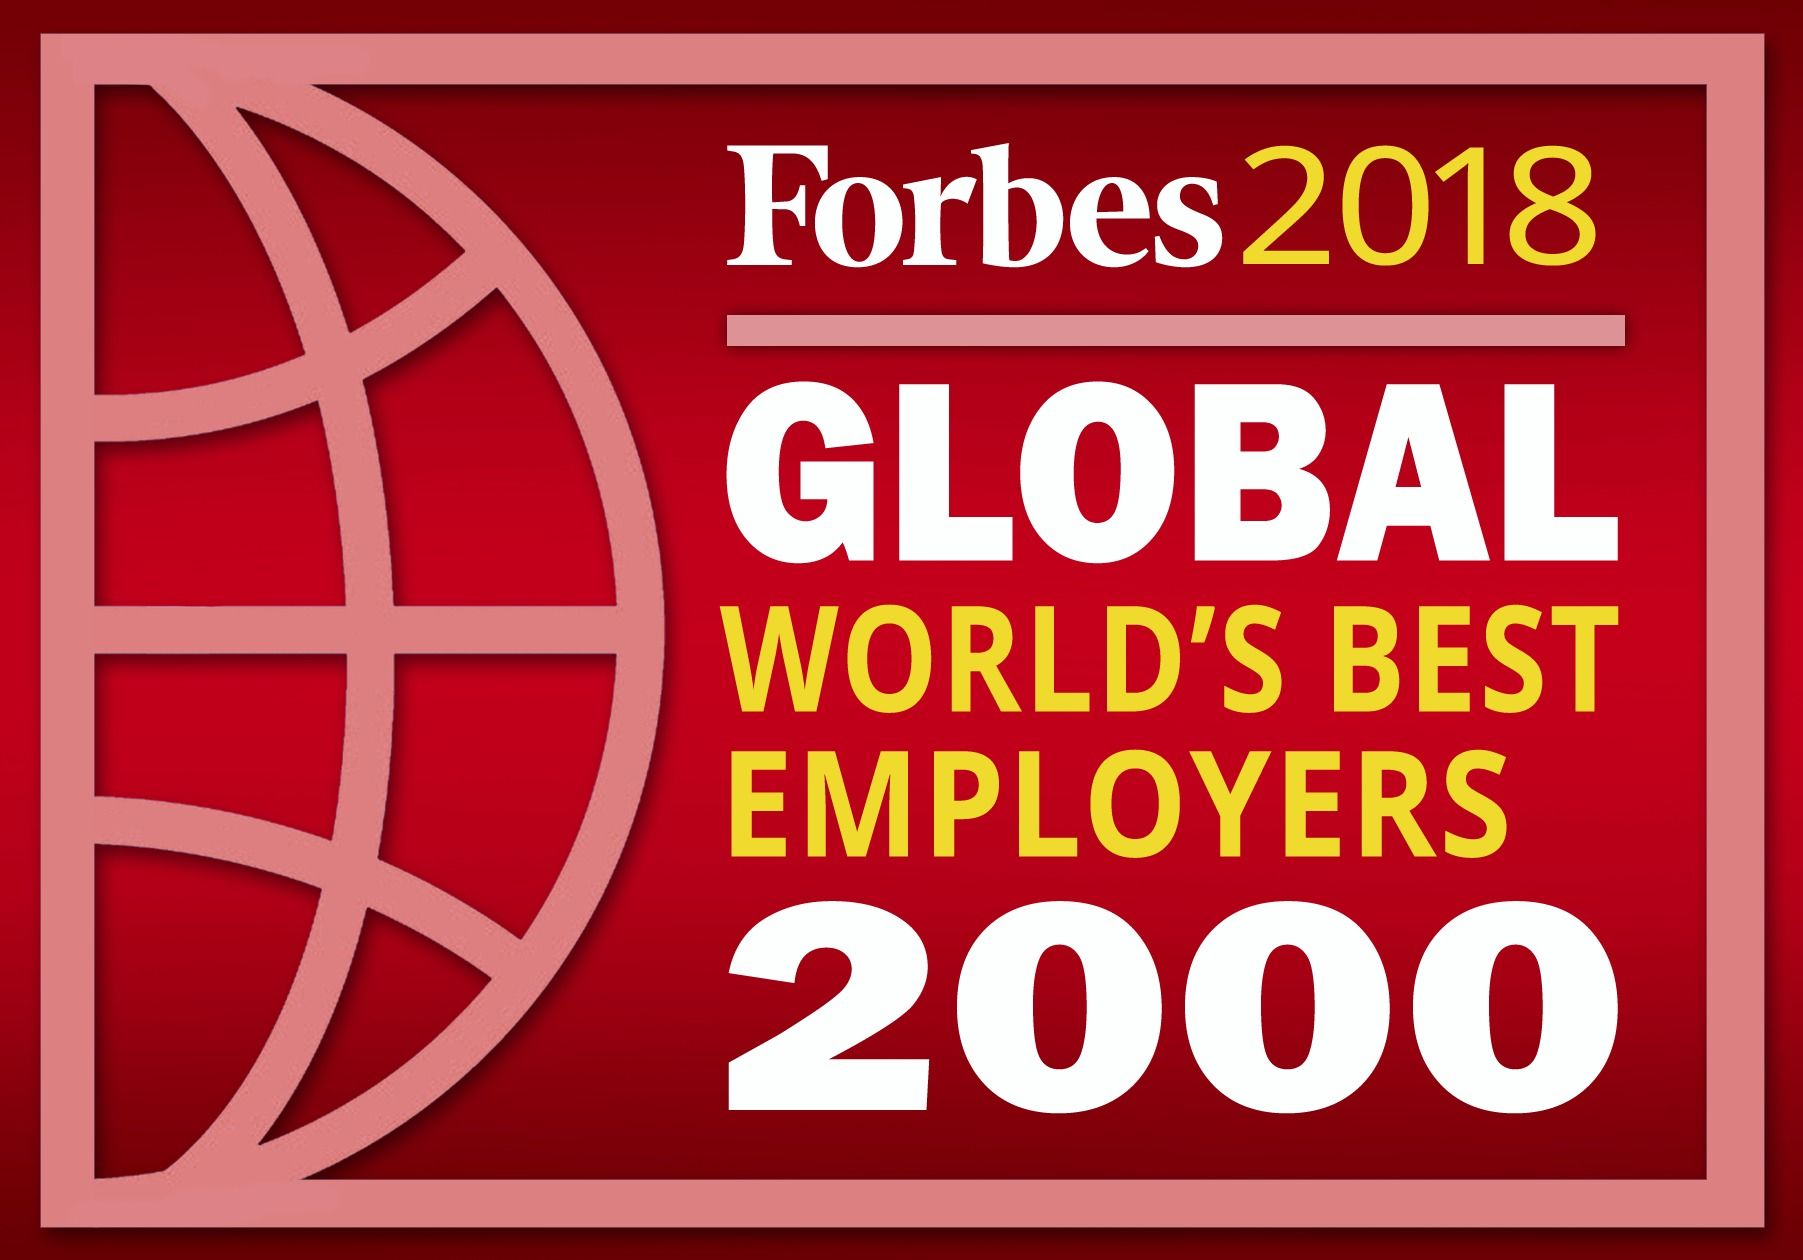 Agilent Technologies G2000 Best Employers NO Copy.png